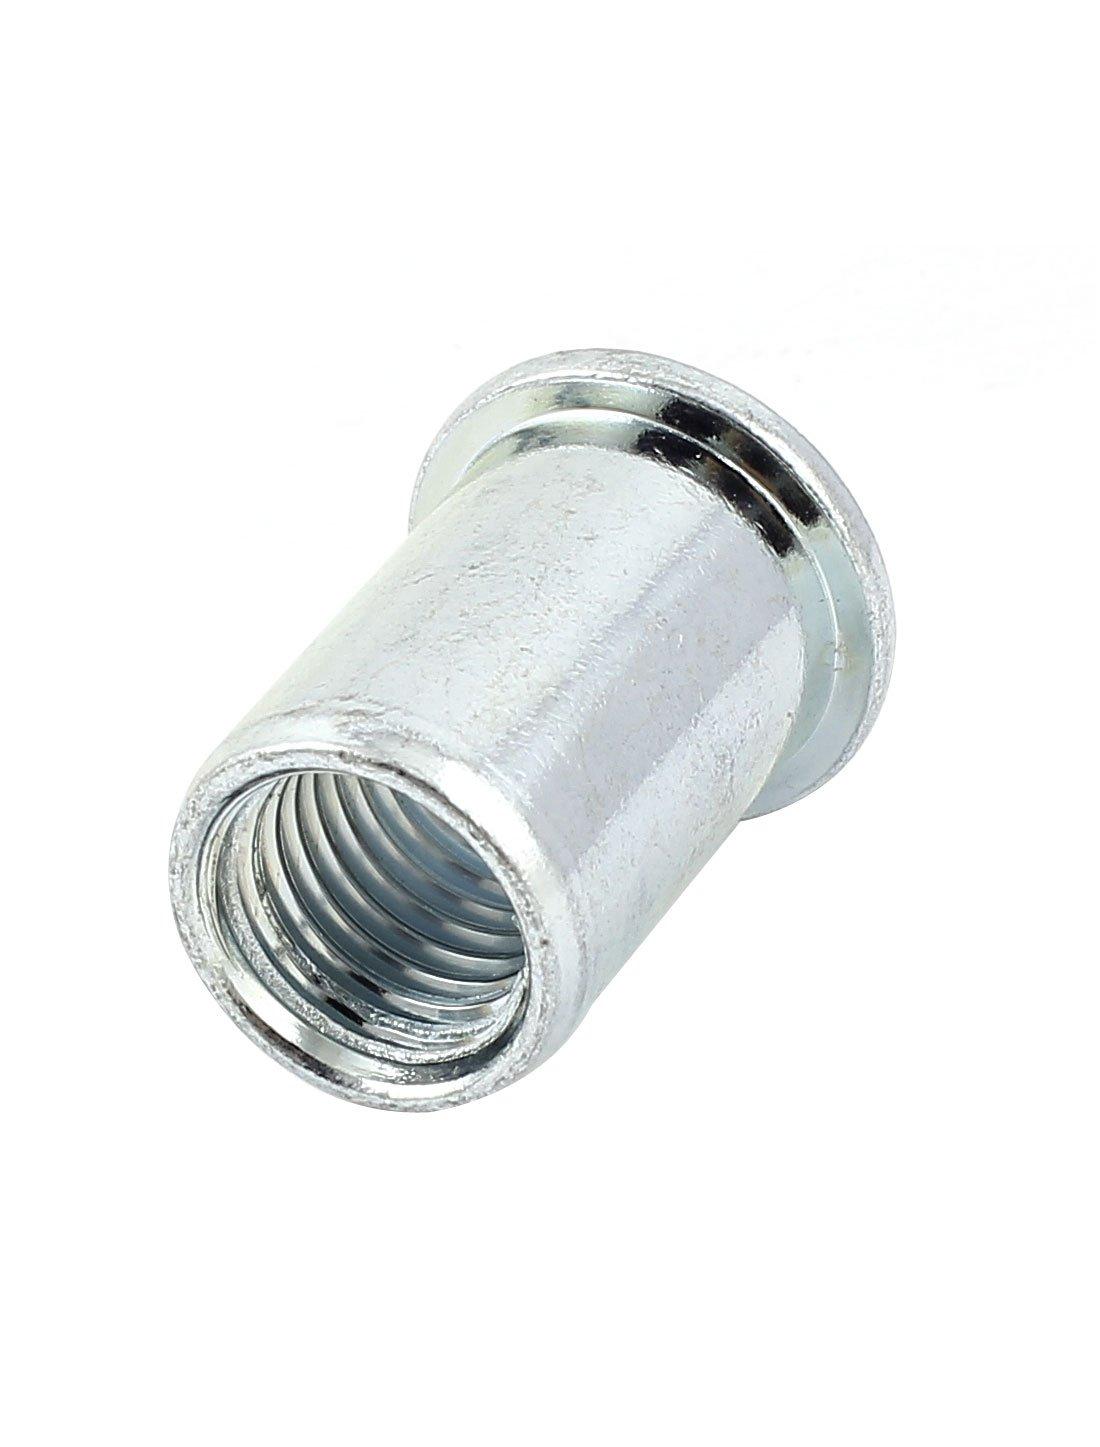 Uxcell a15050400ux0097 Open End Metal Rivet Nut Flat Head Insert Nutsert Fastener M16x33mm Rubber